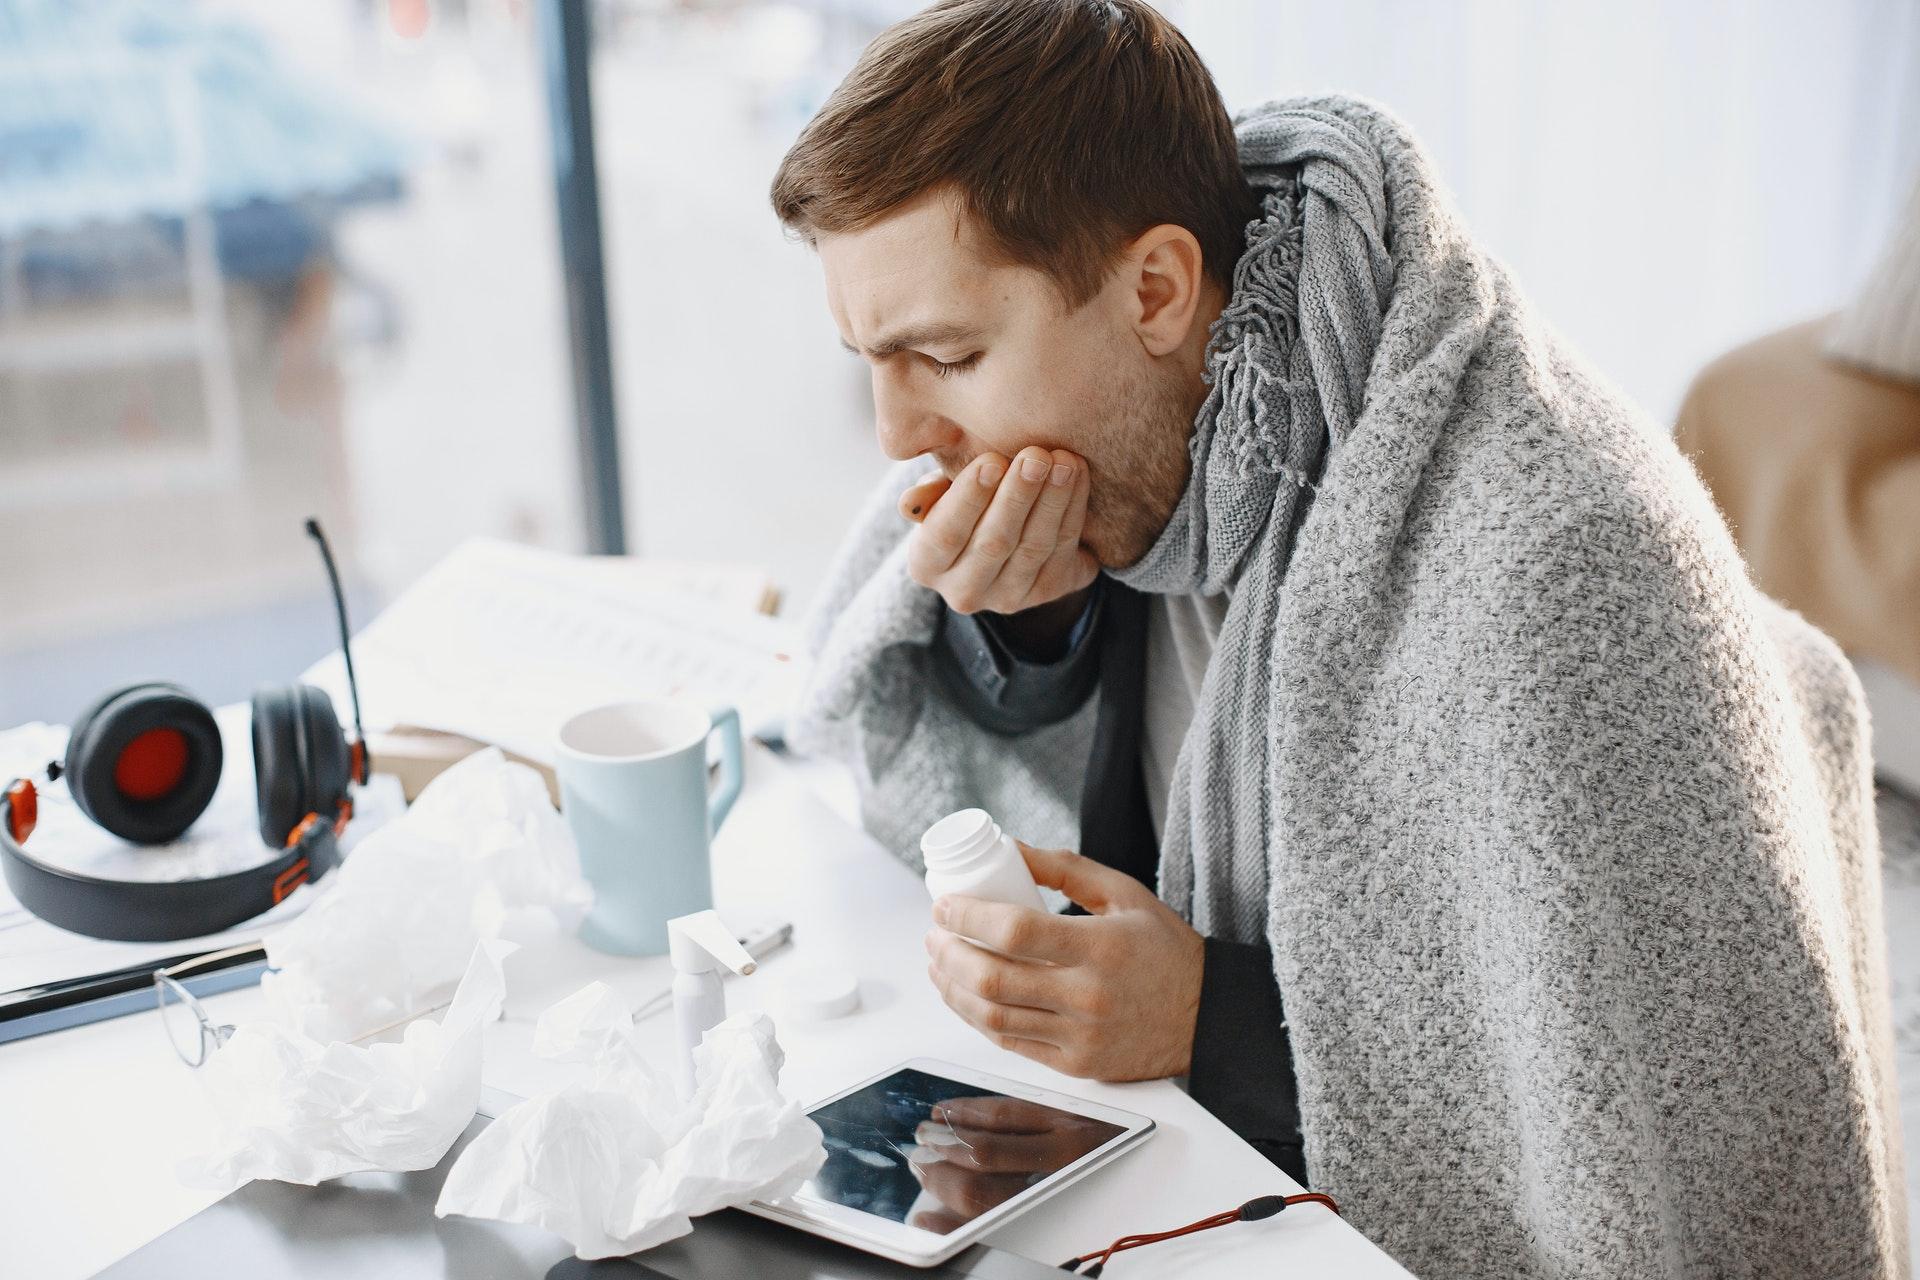 Иммунолог Болибок: Чай с имбирем предотвратит тяжелую форму COVID-19